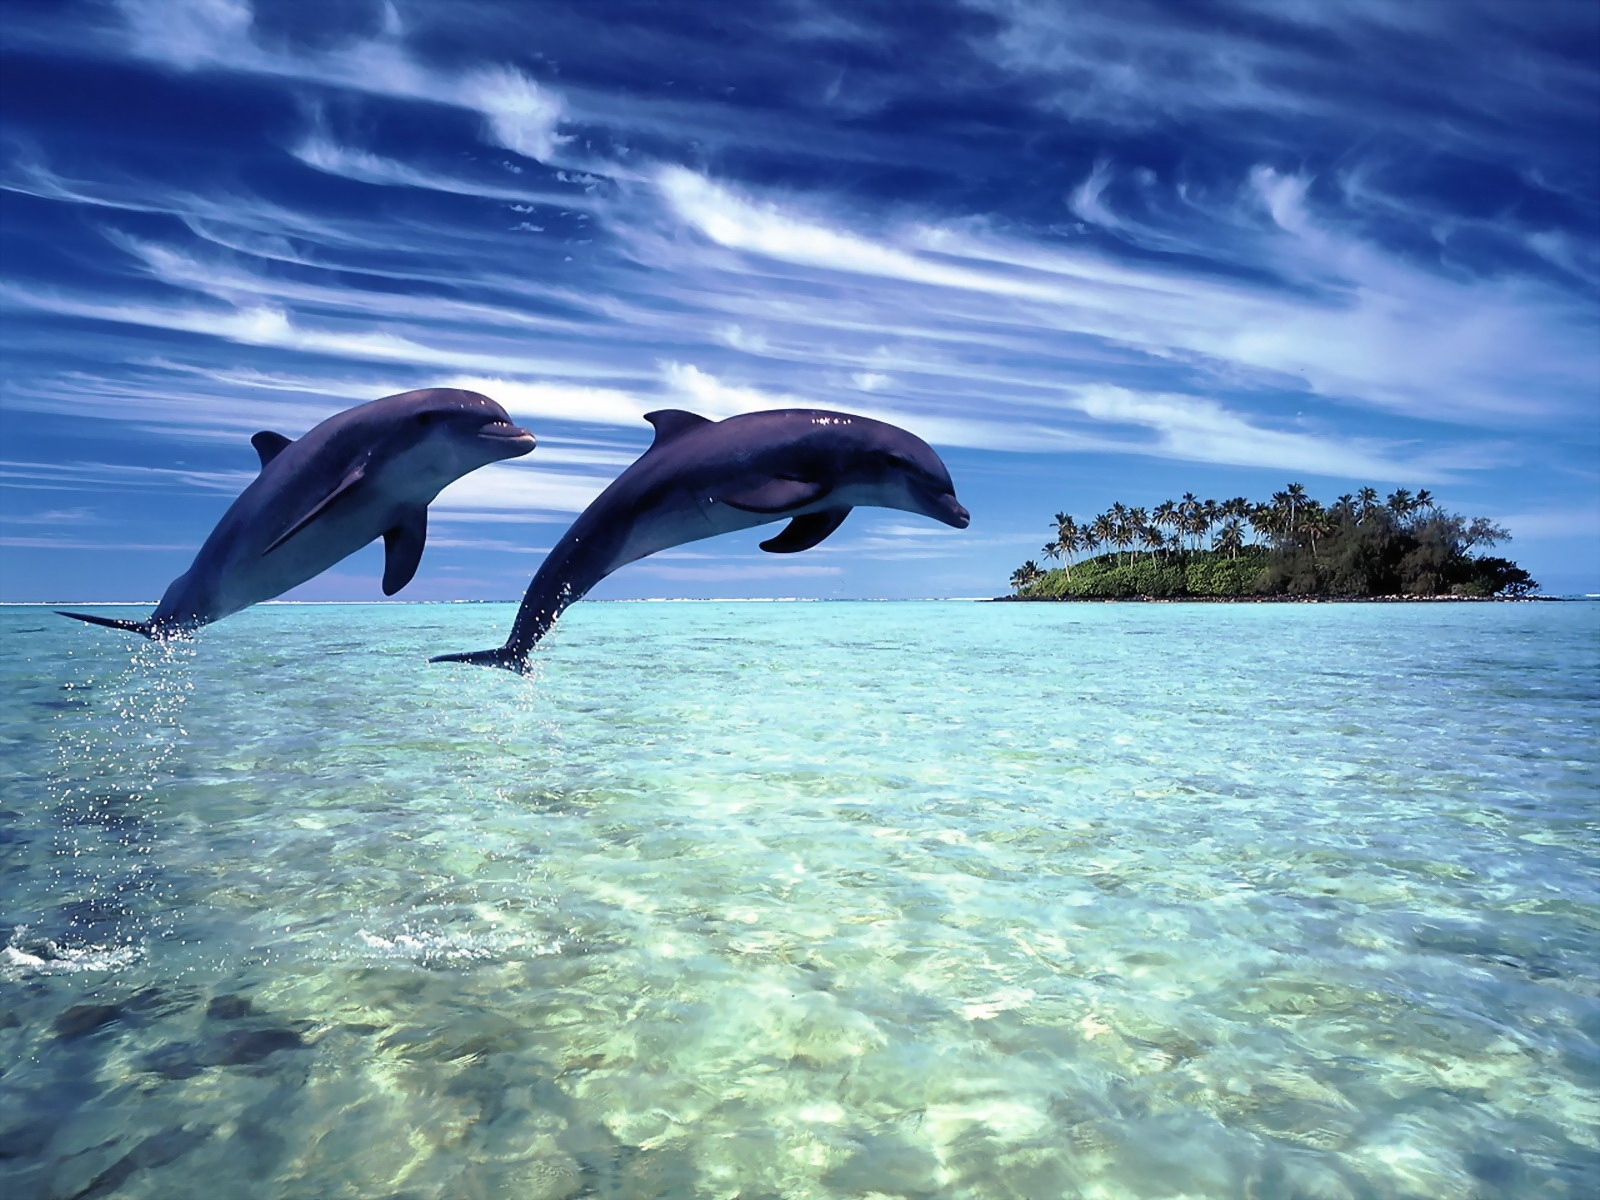 Dolphins Wallpaper Hd Desktop Wallpaper 1600x1200